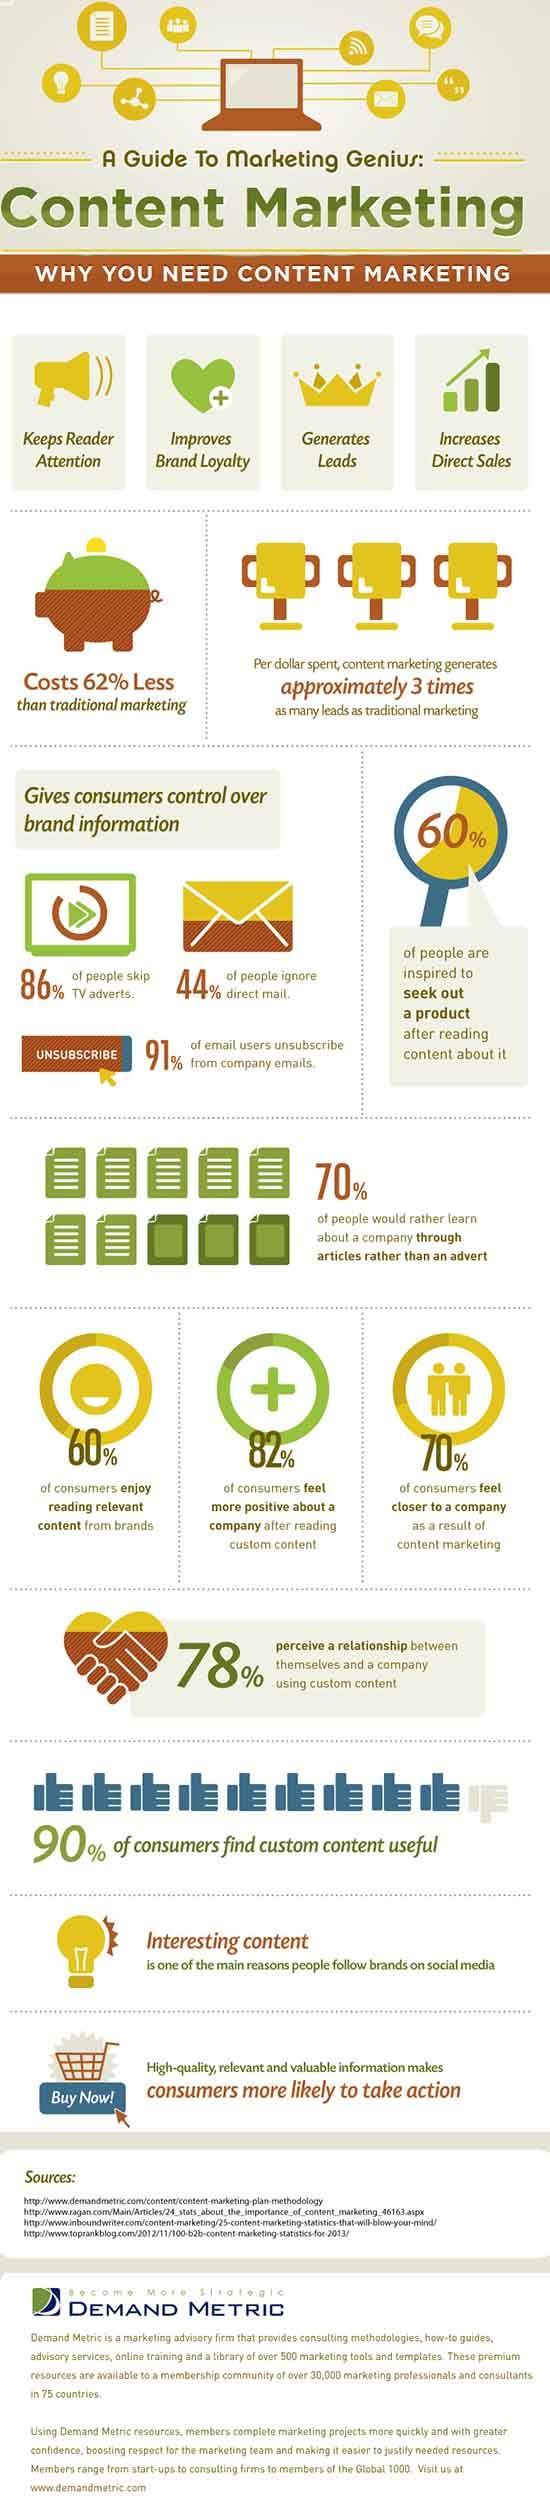 Content marketing social media marketing #Infographic www.socialmediamamma.com